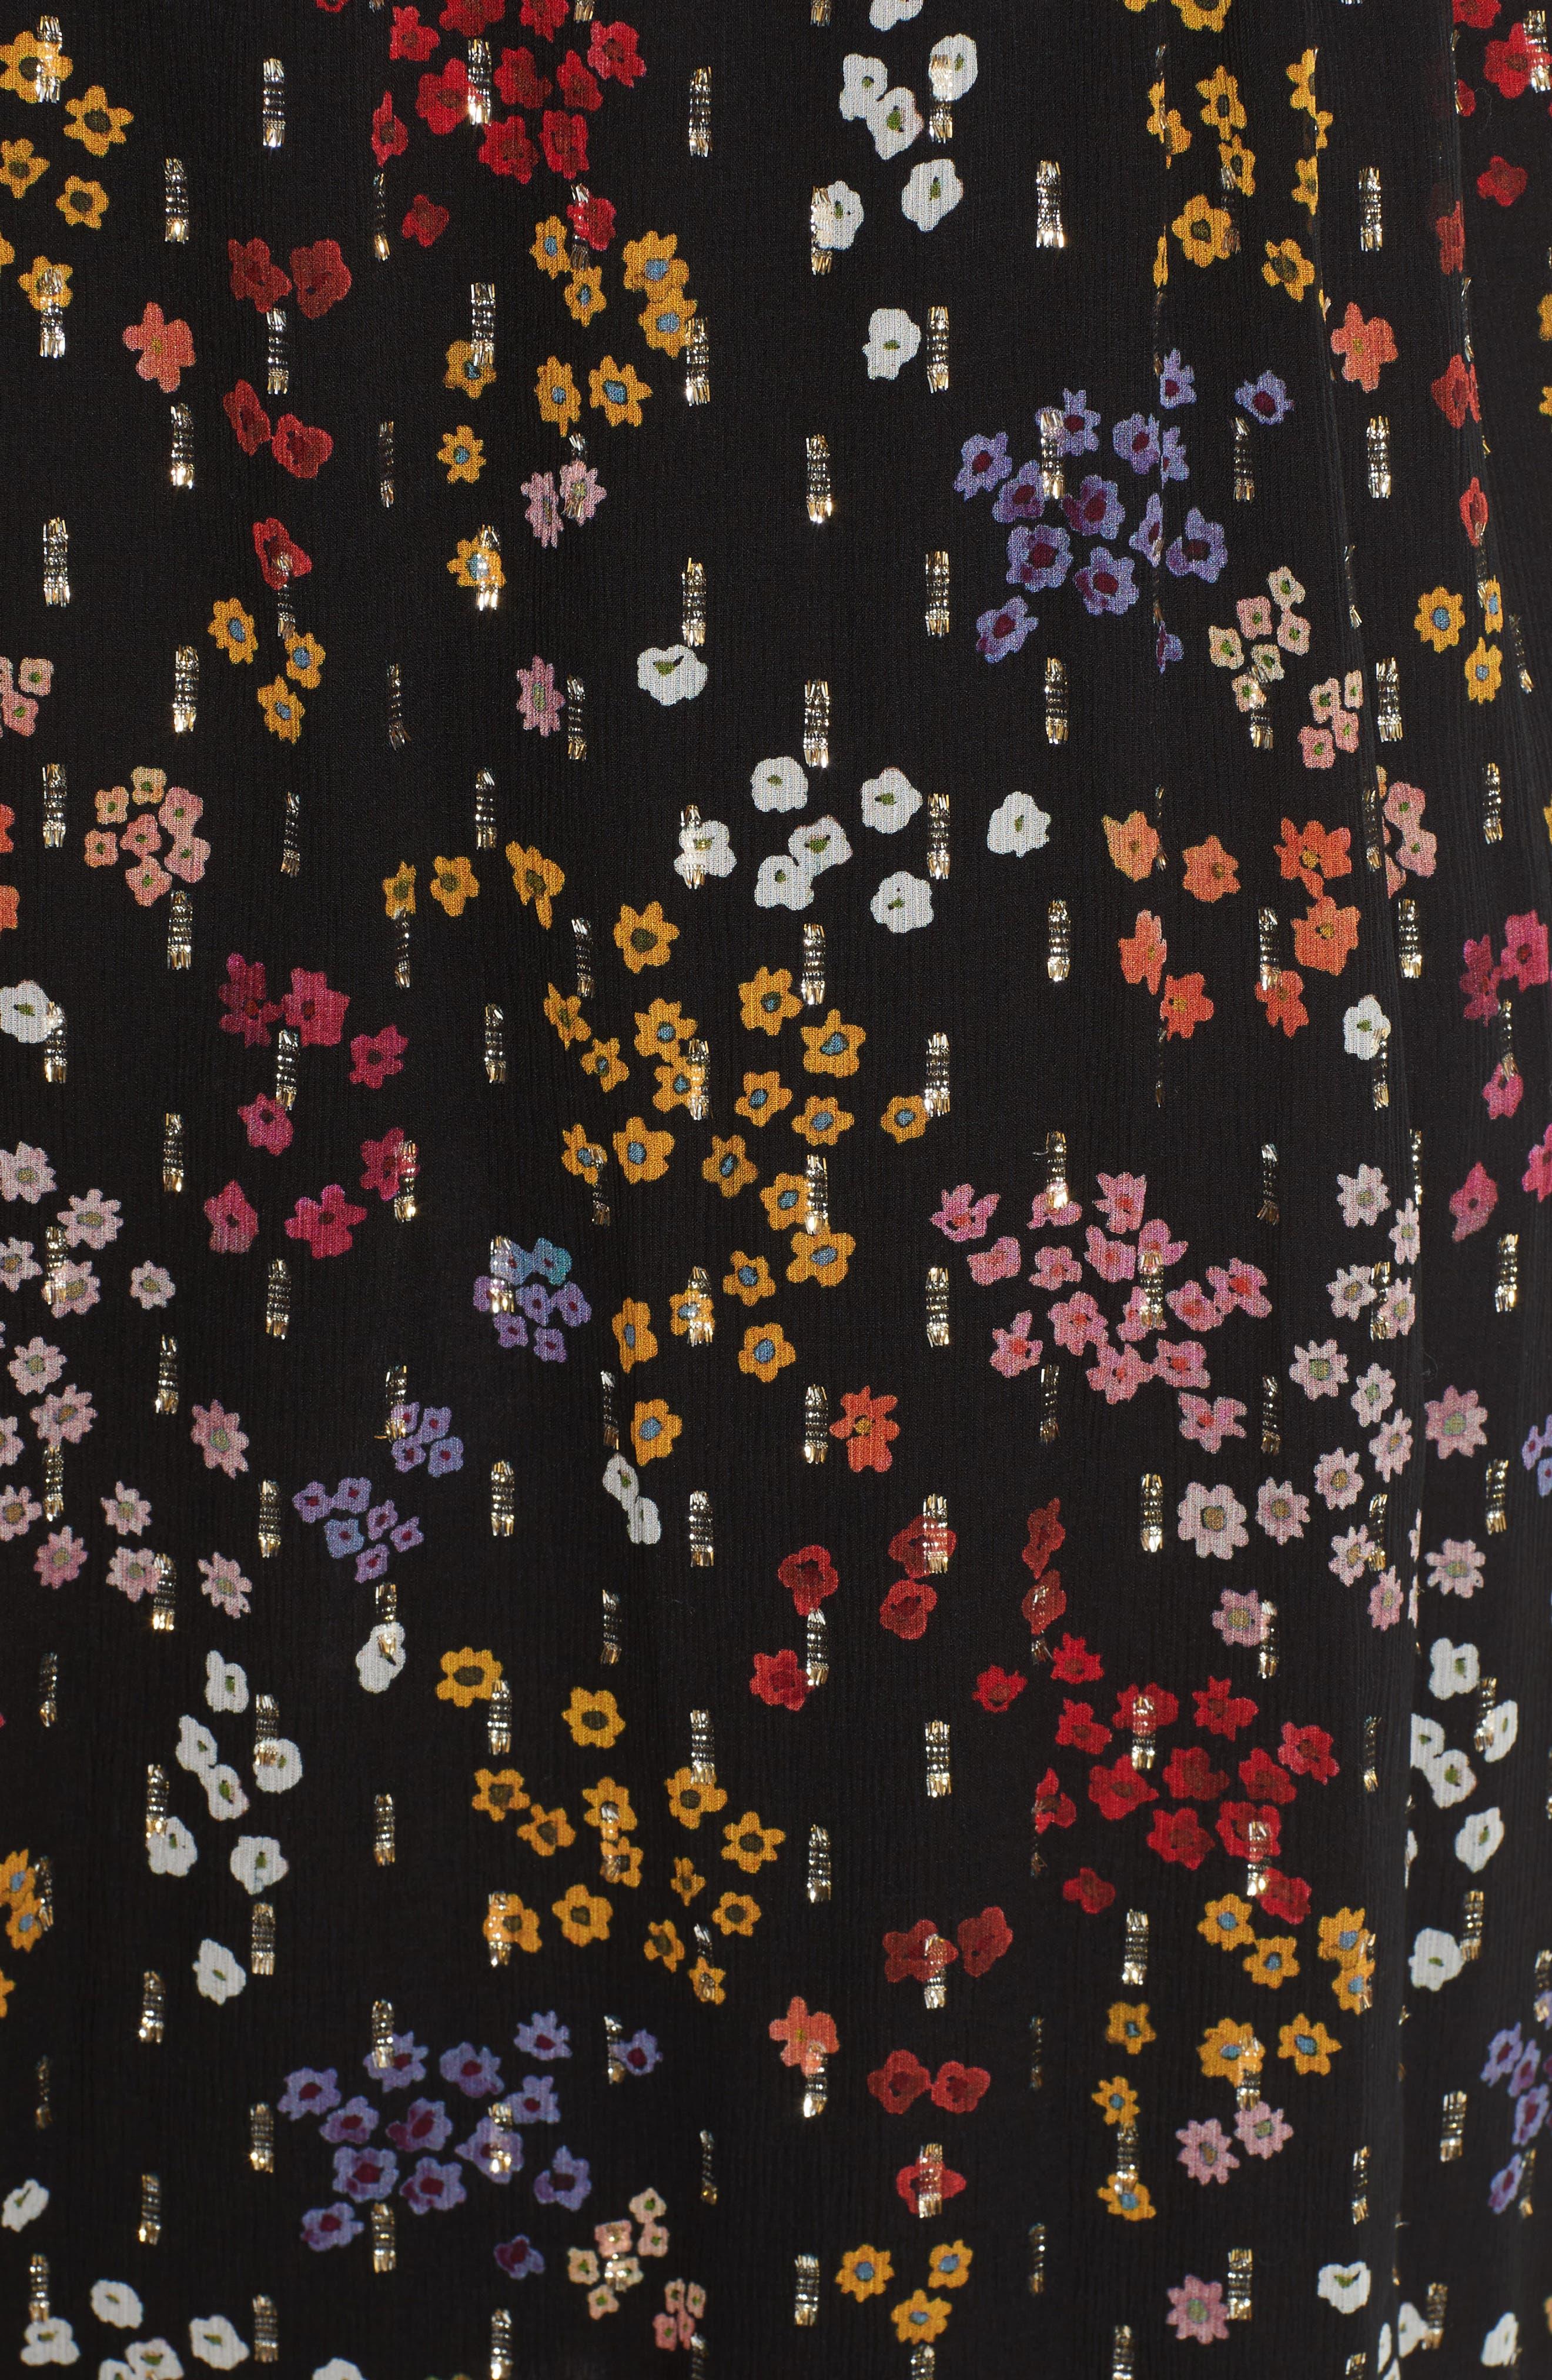 Floral Print Metallic Silk Midi Dress,                             Alternate thumbnail 5, color,                             001